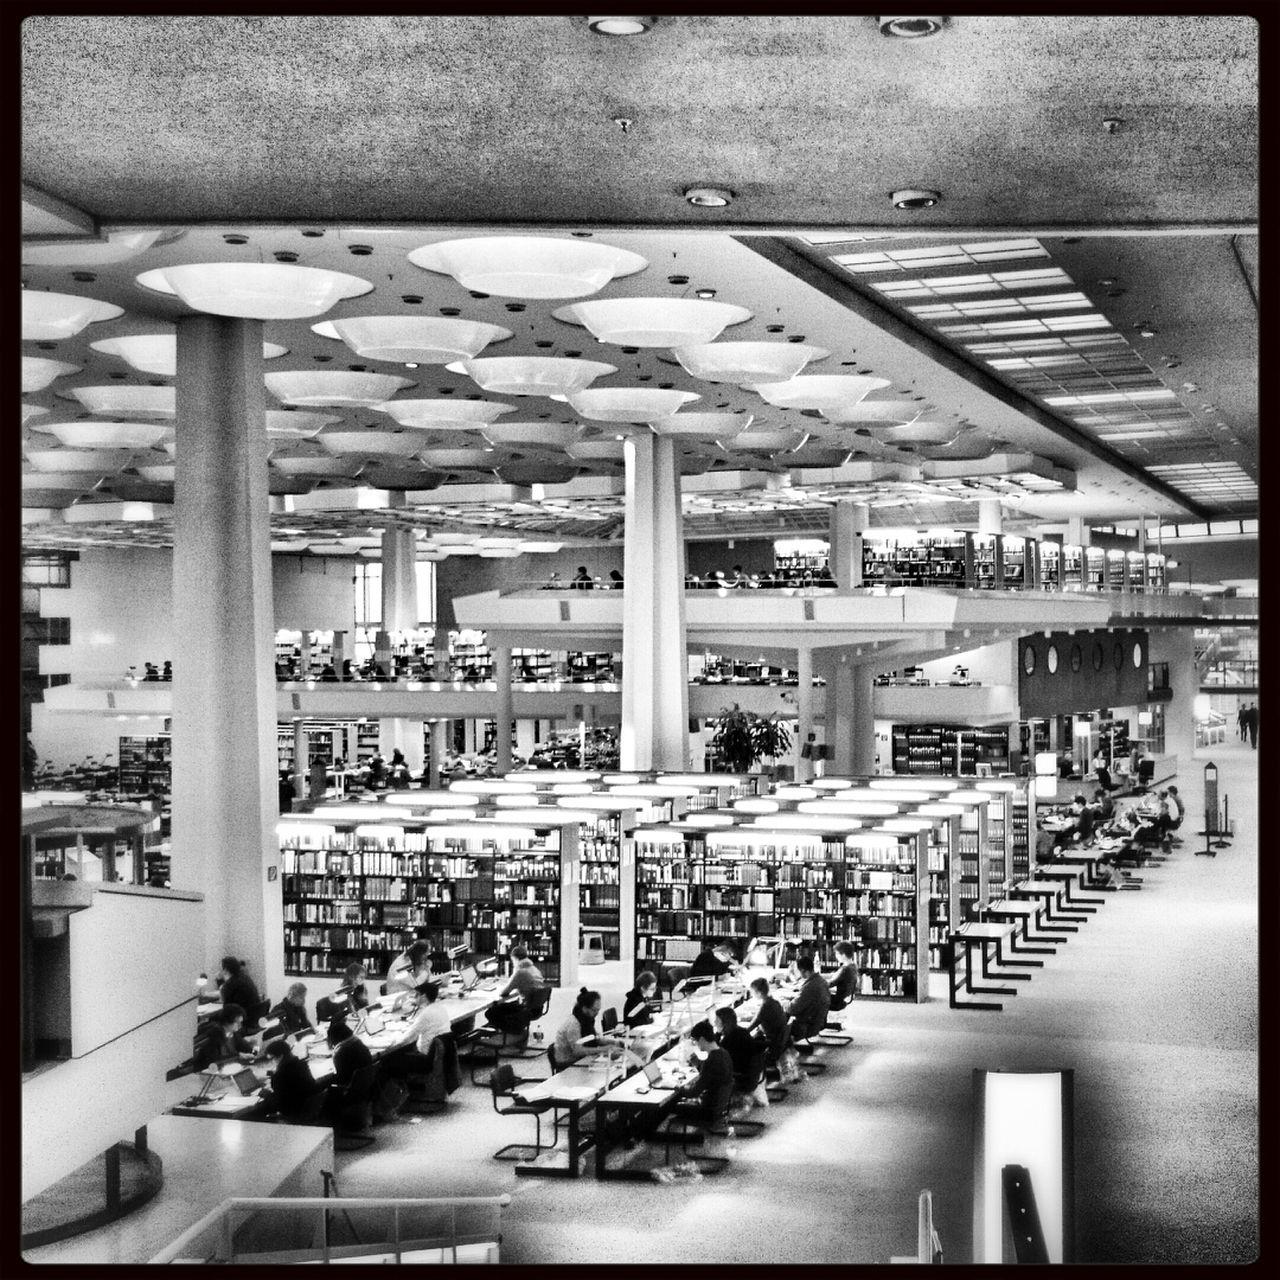 Lesesaal Berlin Architecture Architecture_bw Scharoun